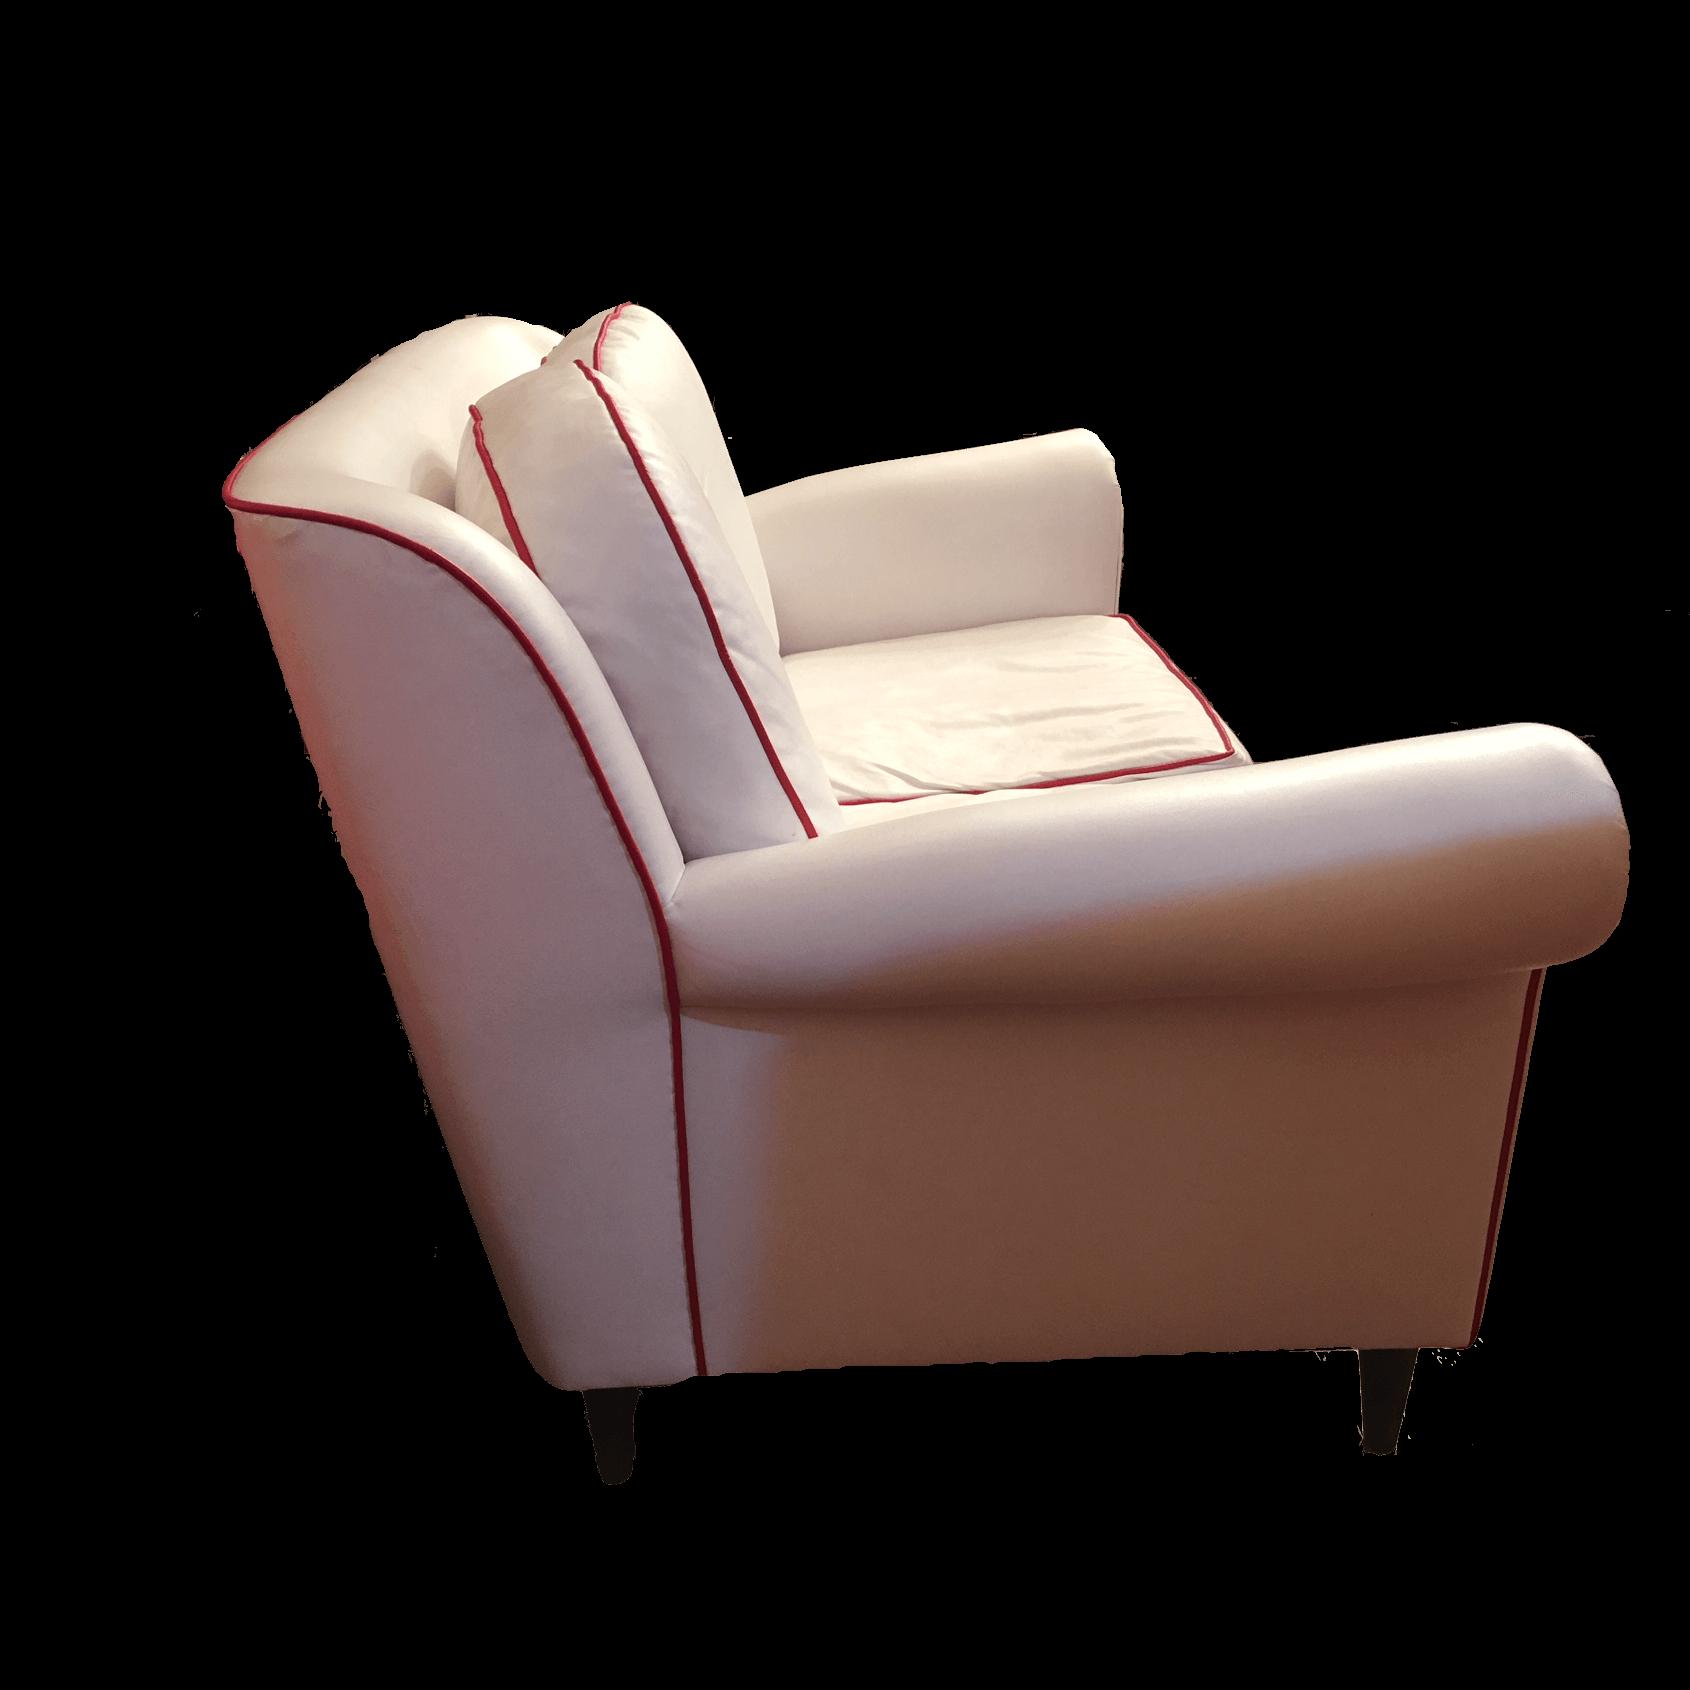 Divano in eco pelle bianco divani vintage bogys50s for Divani larghezza 150 cm